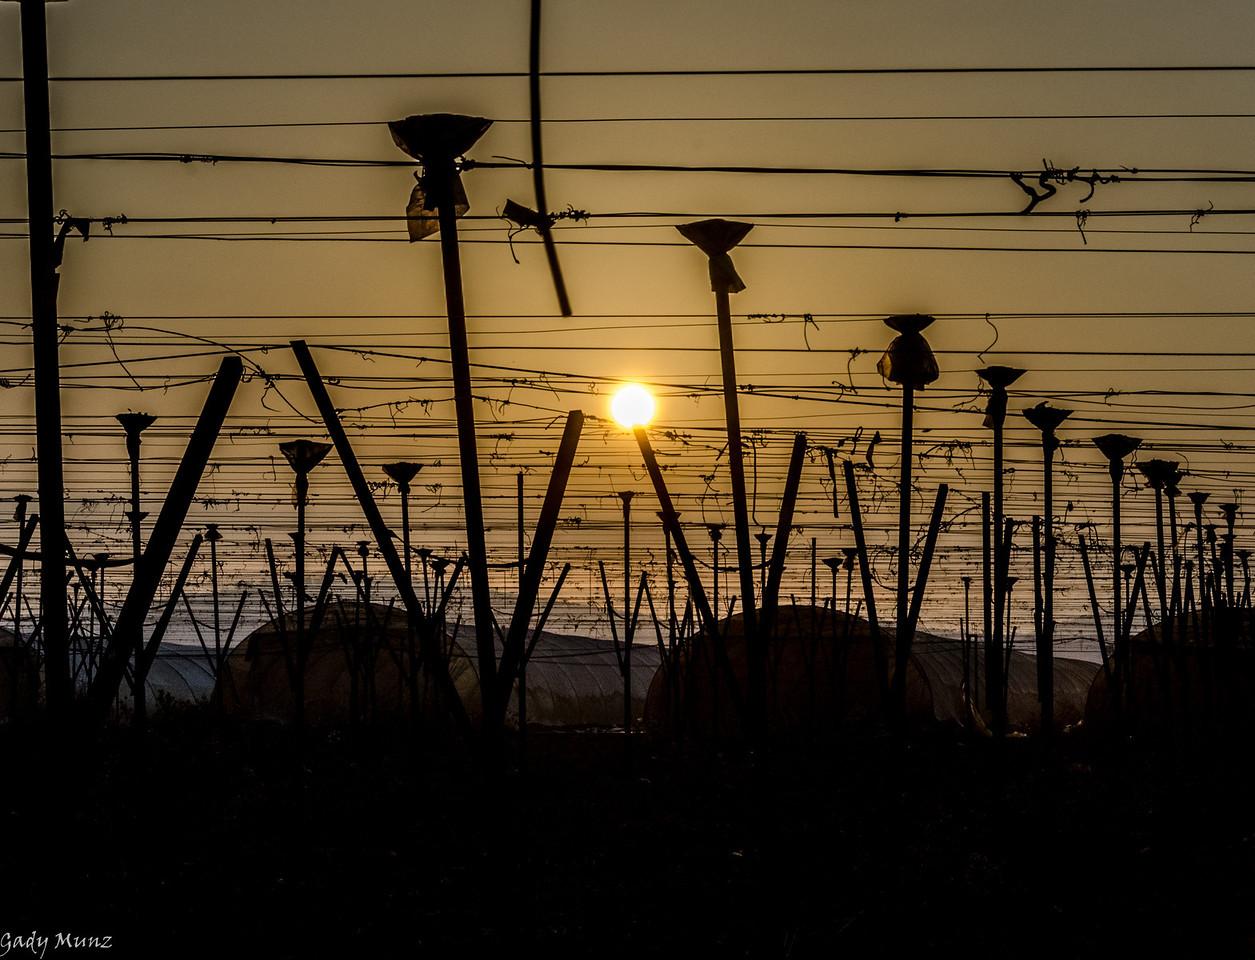 Lachish Vineyards, Israel - dawn